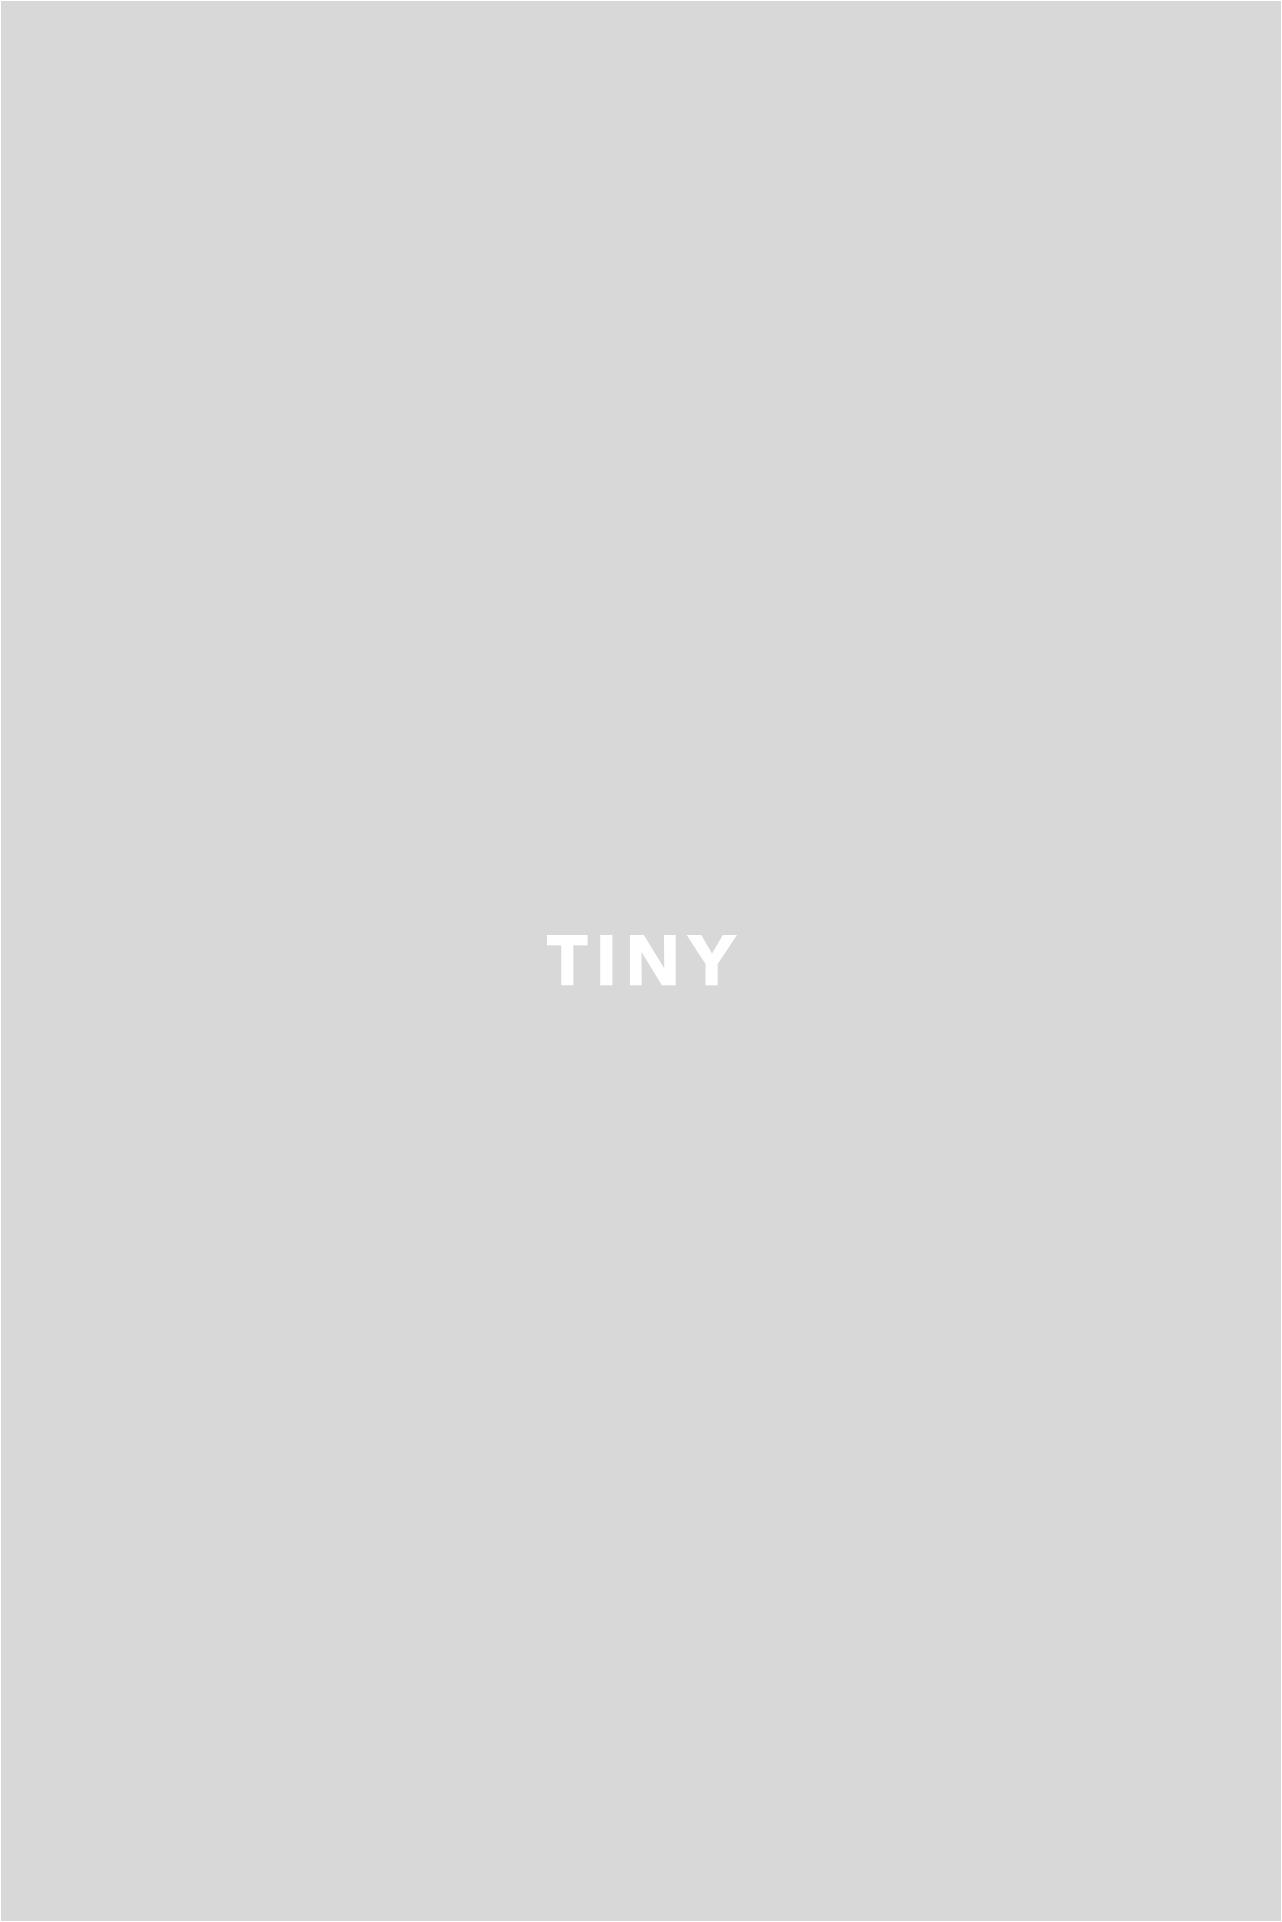 Mini Birds Puzzle - Grouse